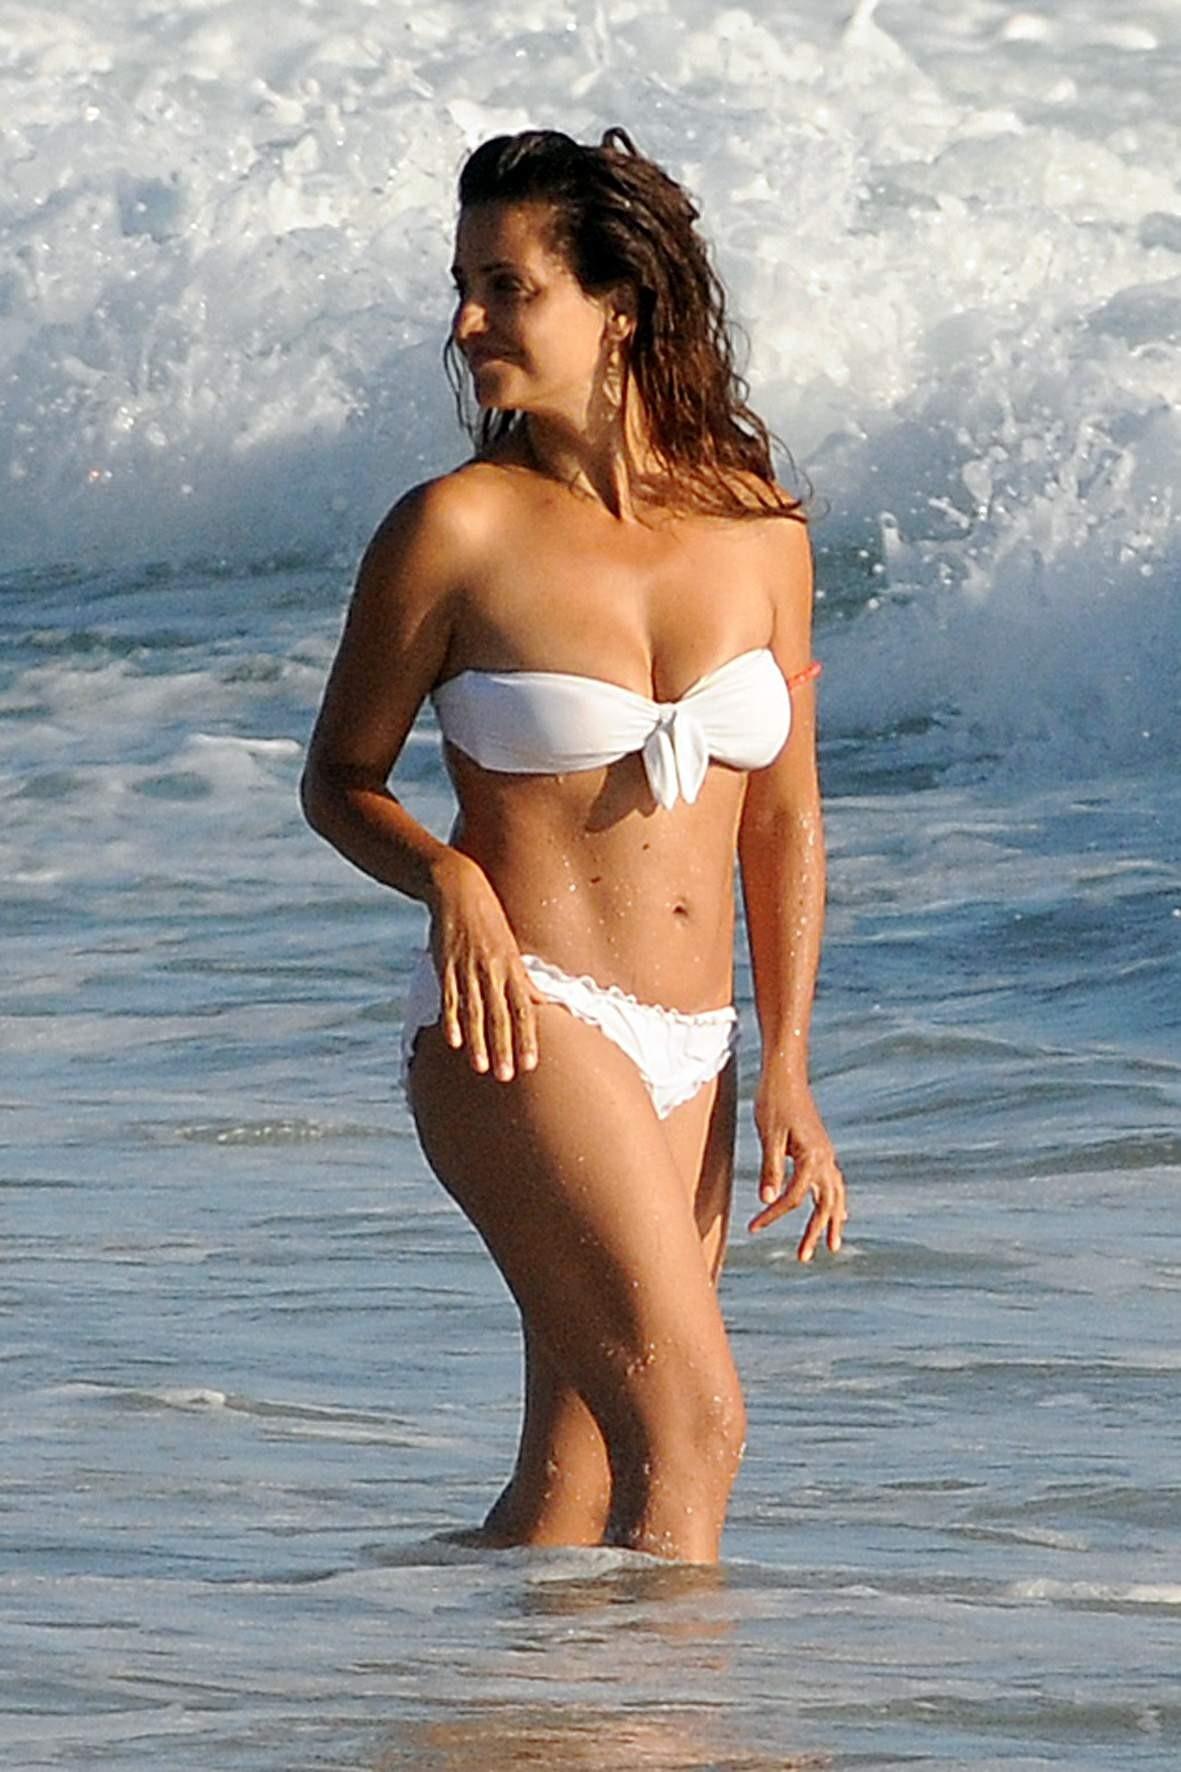 Monica sales in bikini